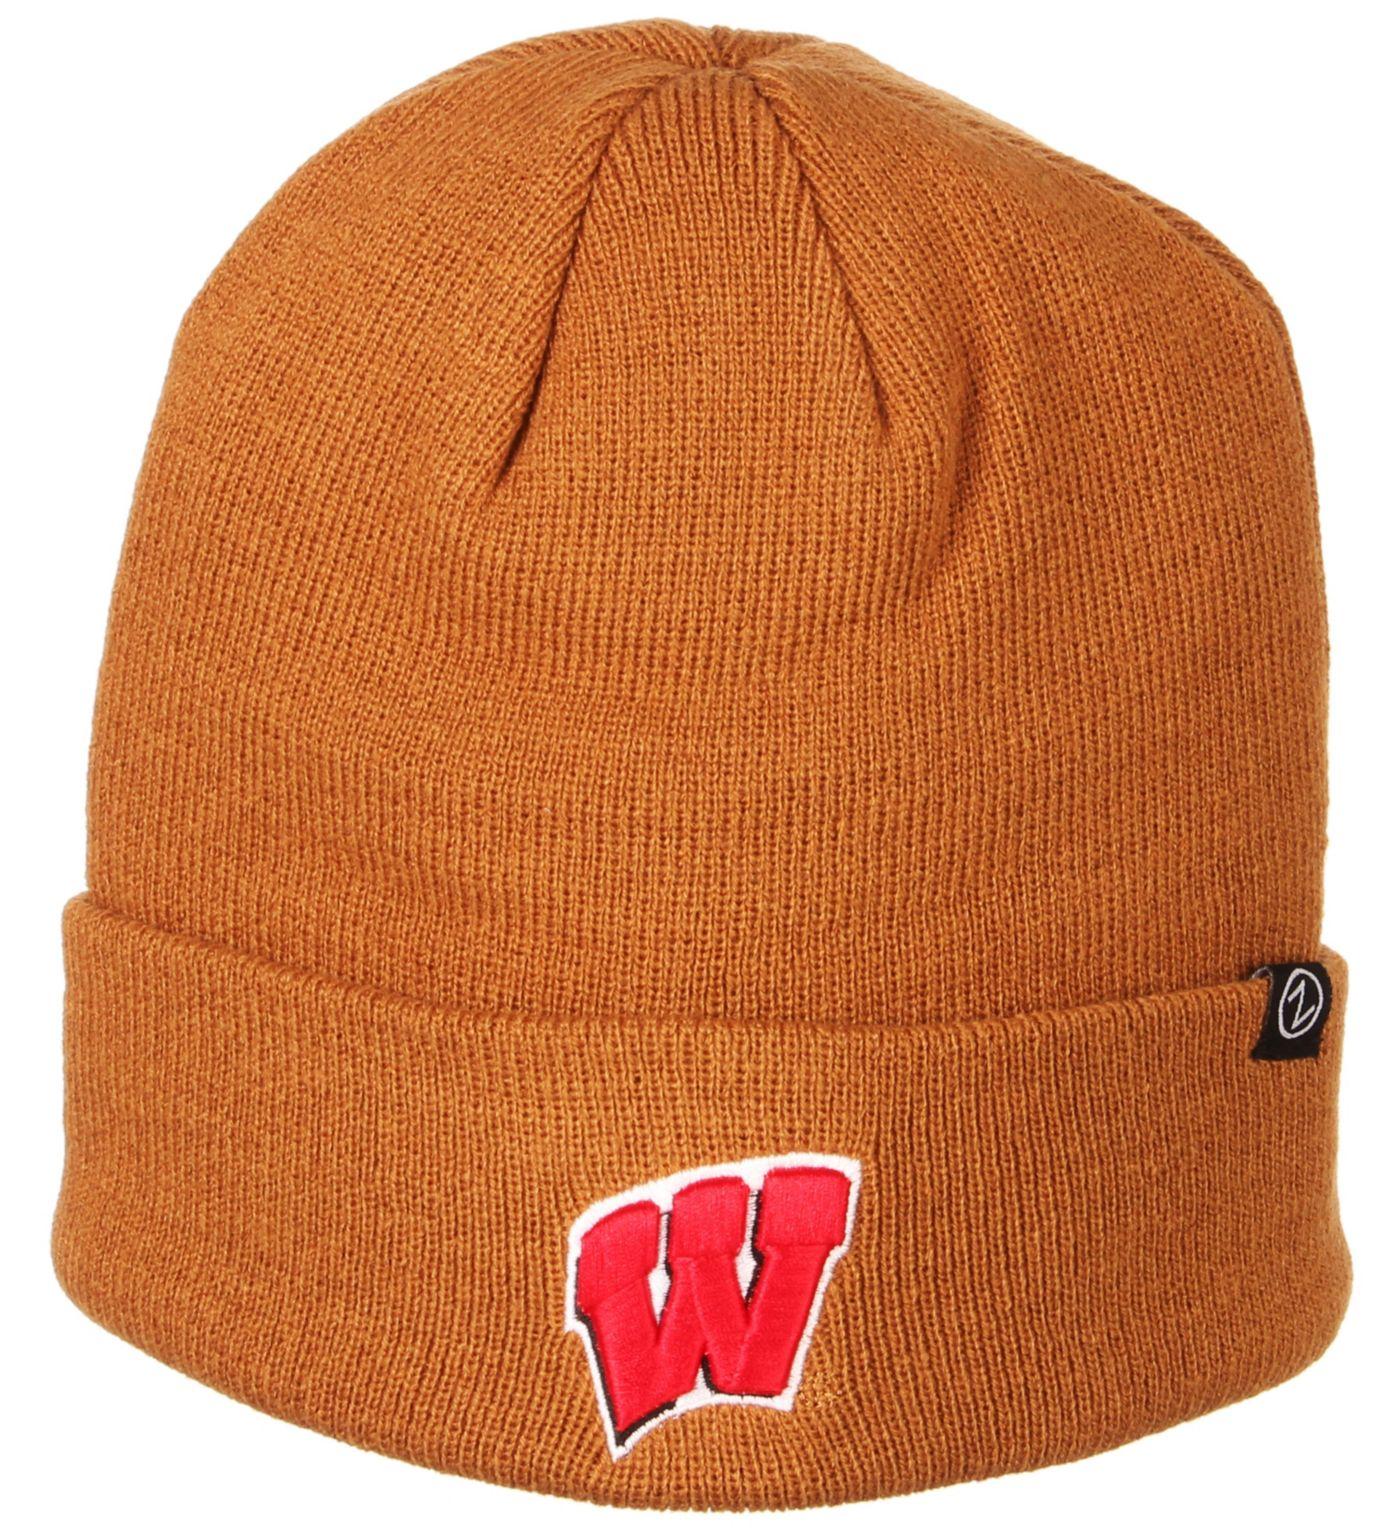 Zephyr Men's Wisconsin Badgers Brown Cuffed Knit Beanie